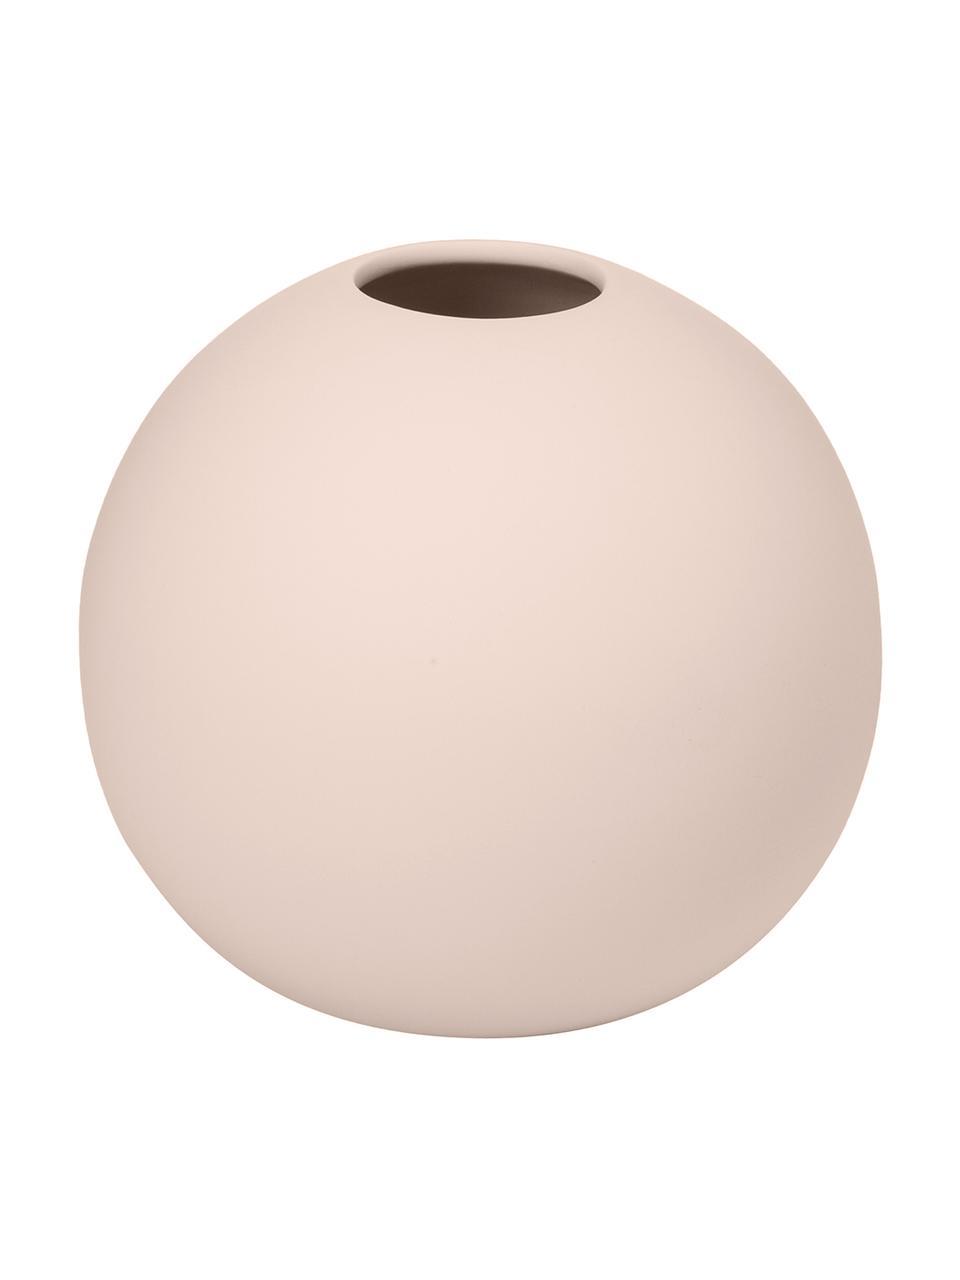 Handgefertigte Kugel-Vase Ball, Keramik, Rosa, Ø 10 x H 10 cm